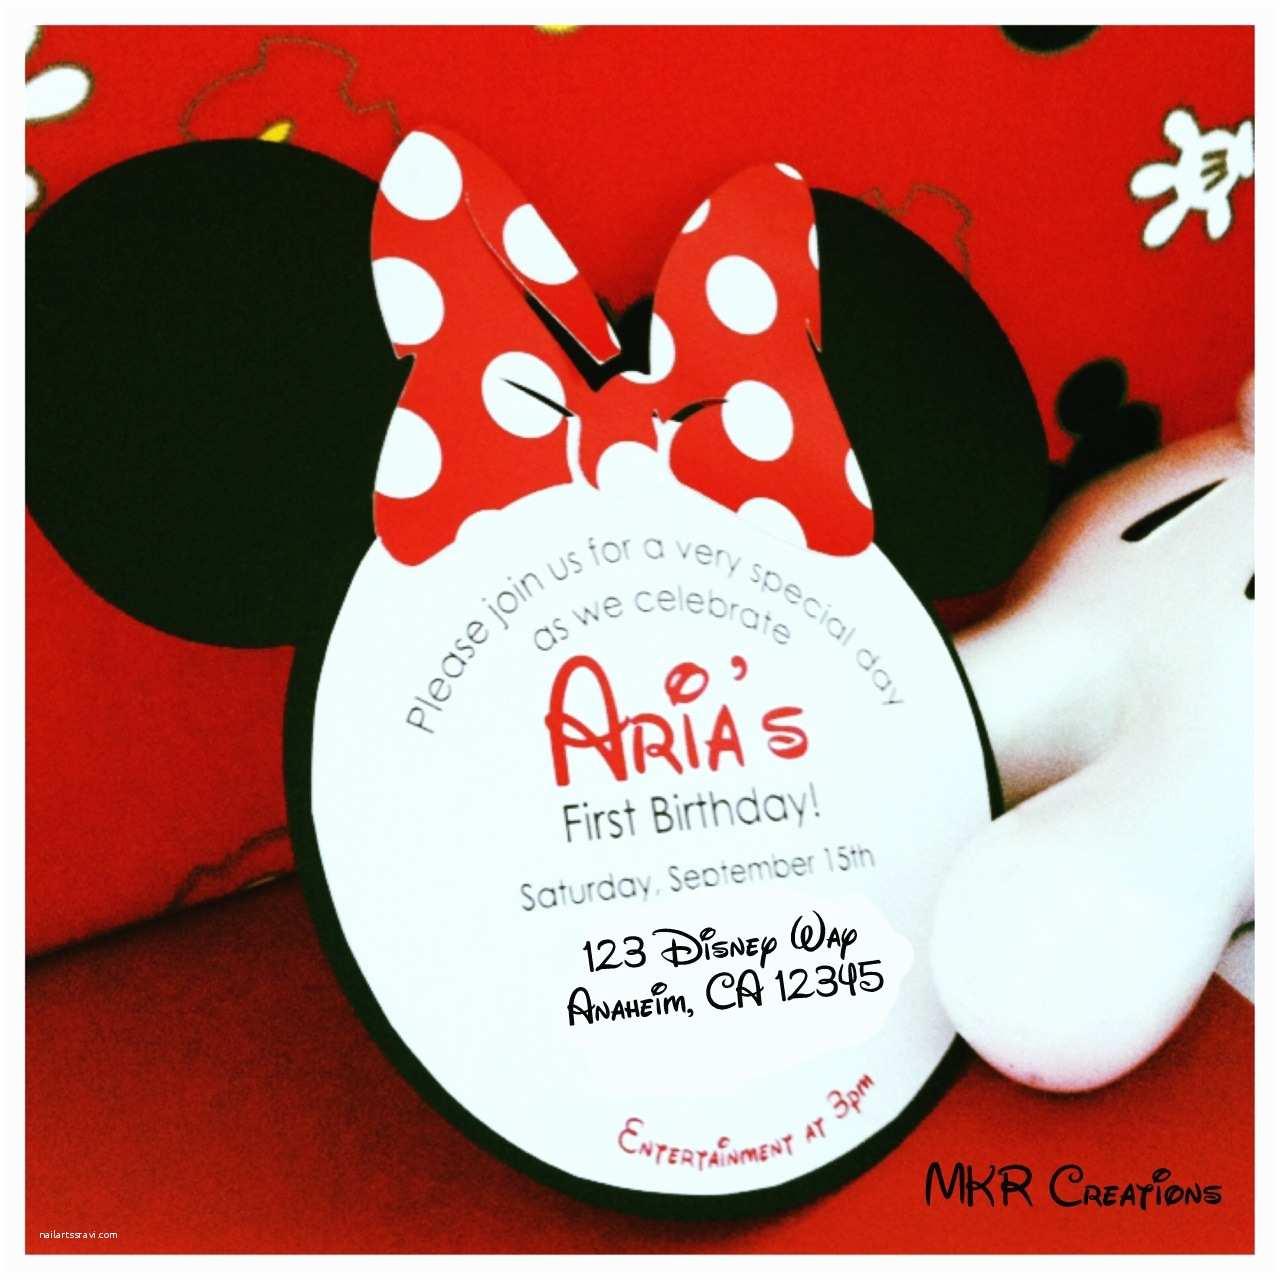 Minnie Mouse 1st Birthday Invitations Mkr Creations Minnie Mouse Invitations